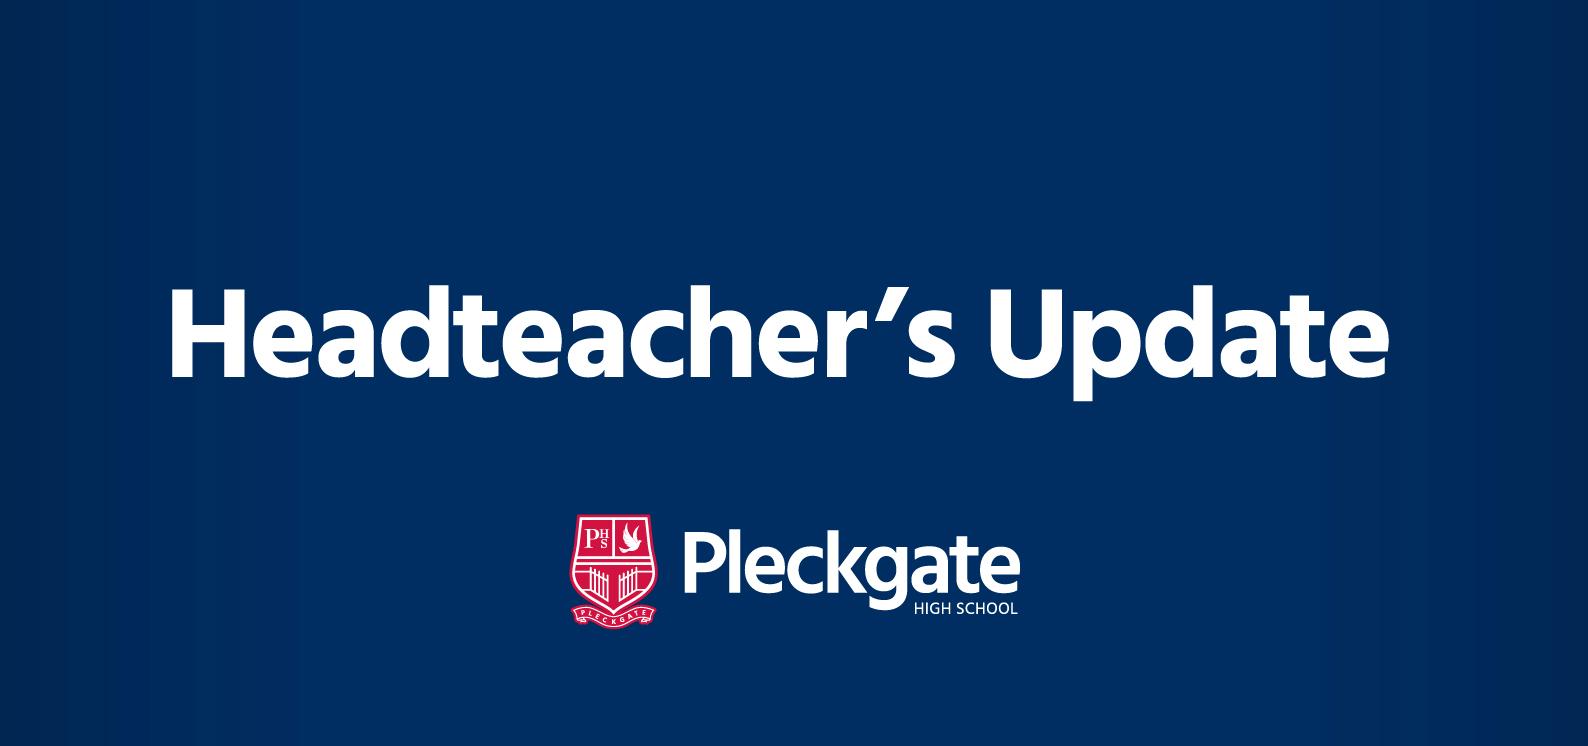 Headteacher's Update – July 2019